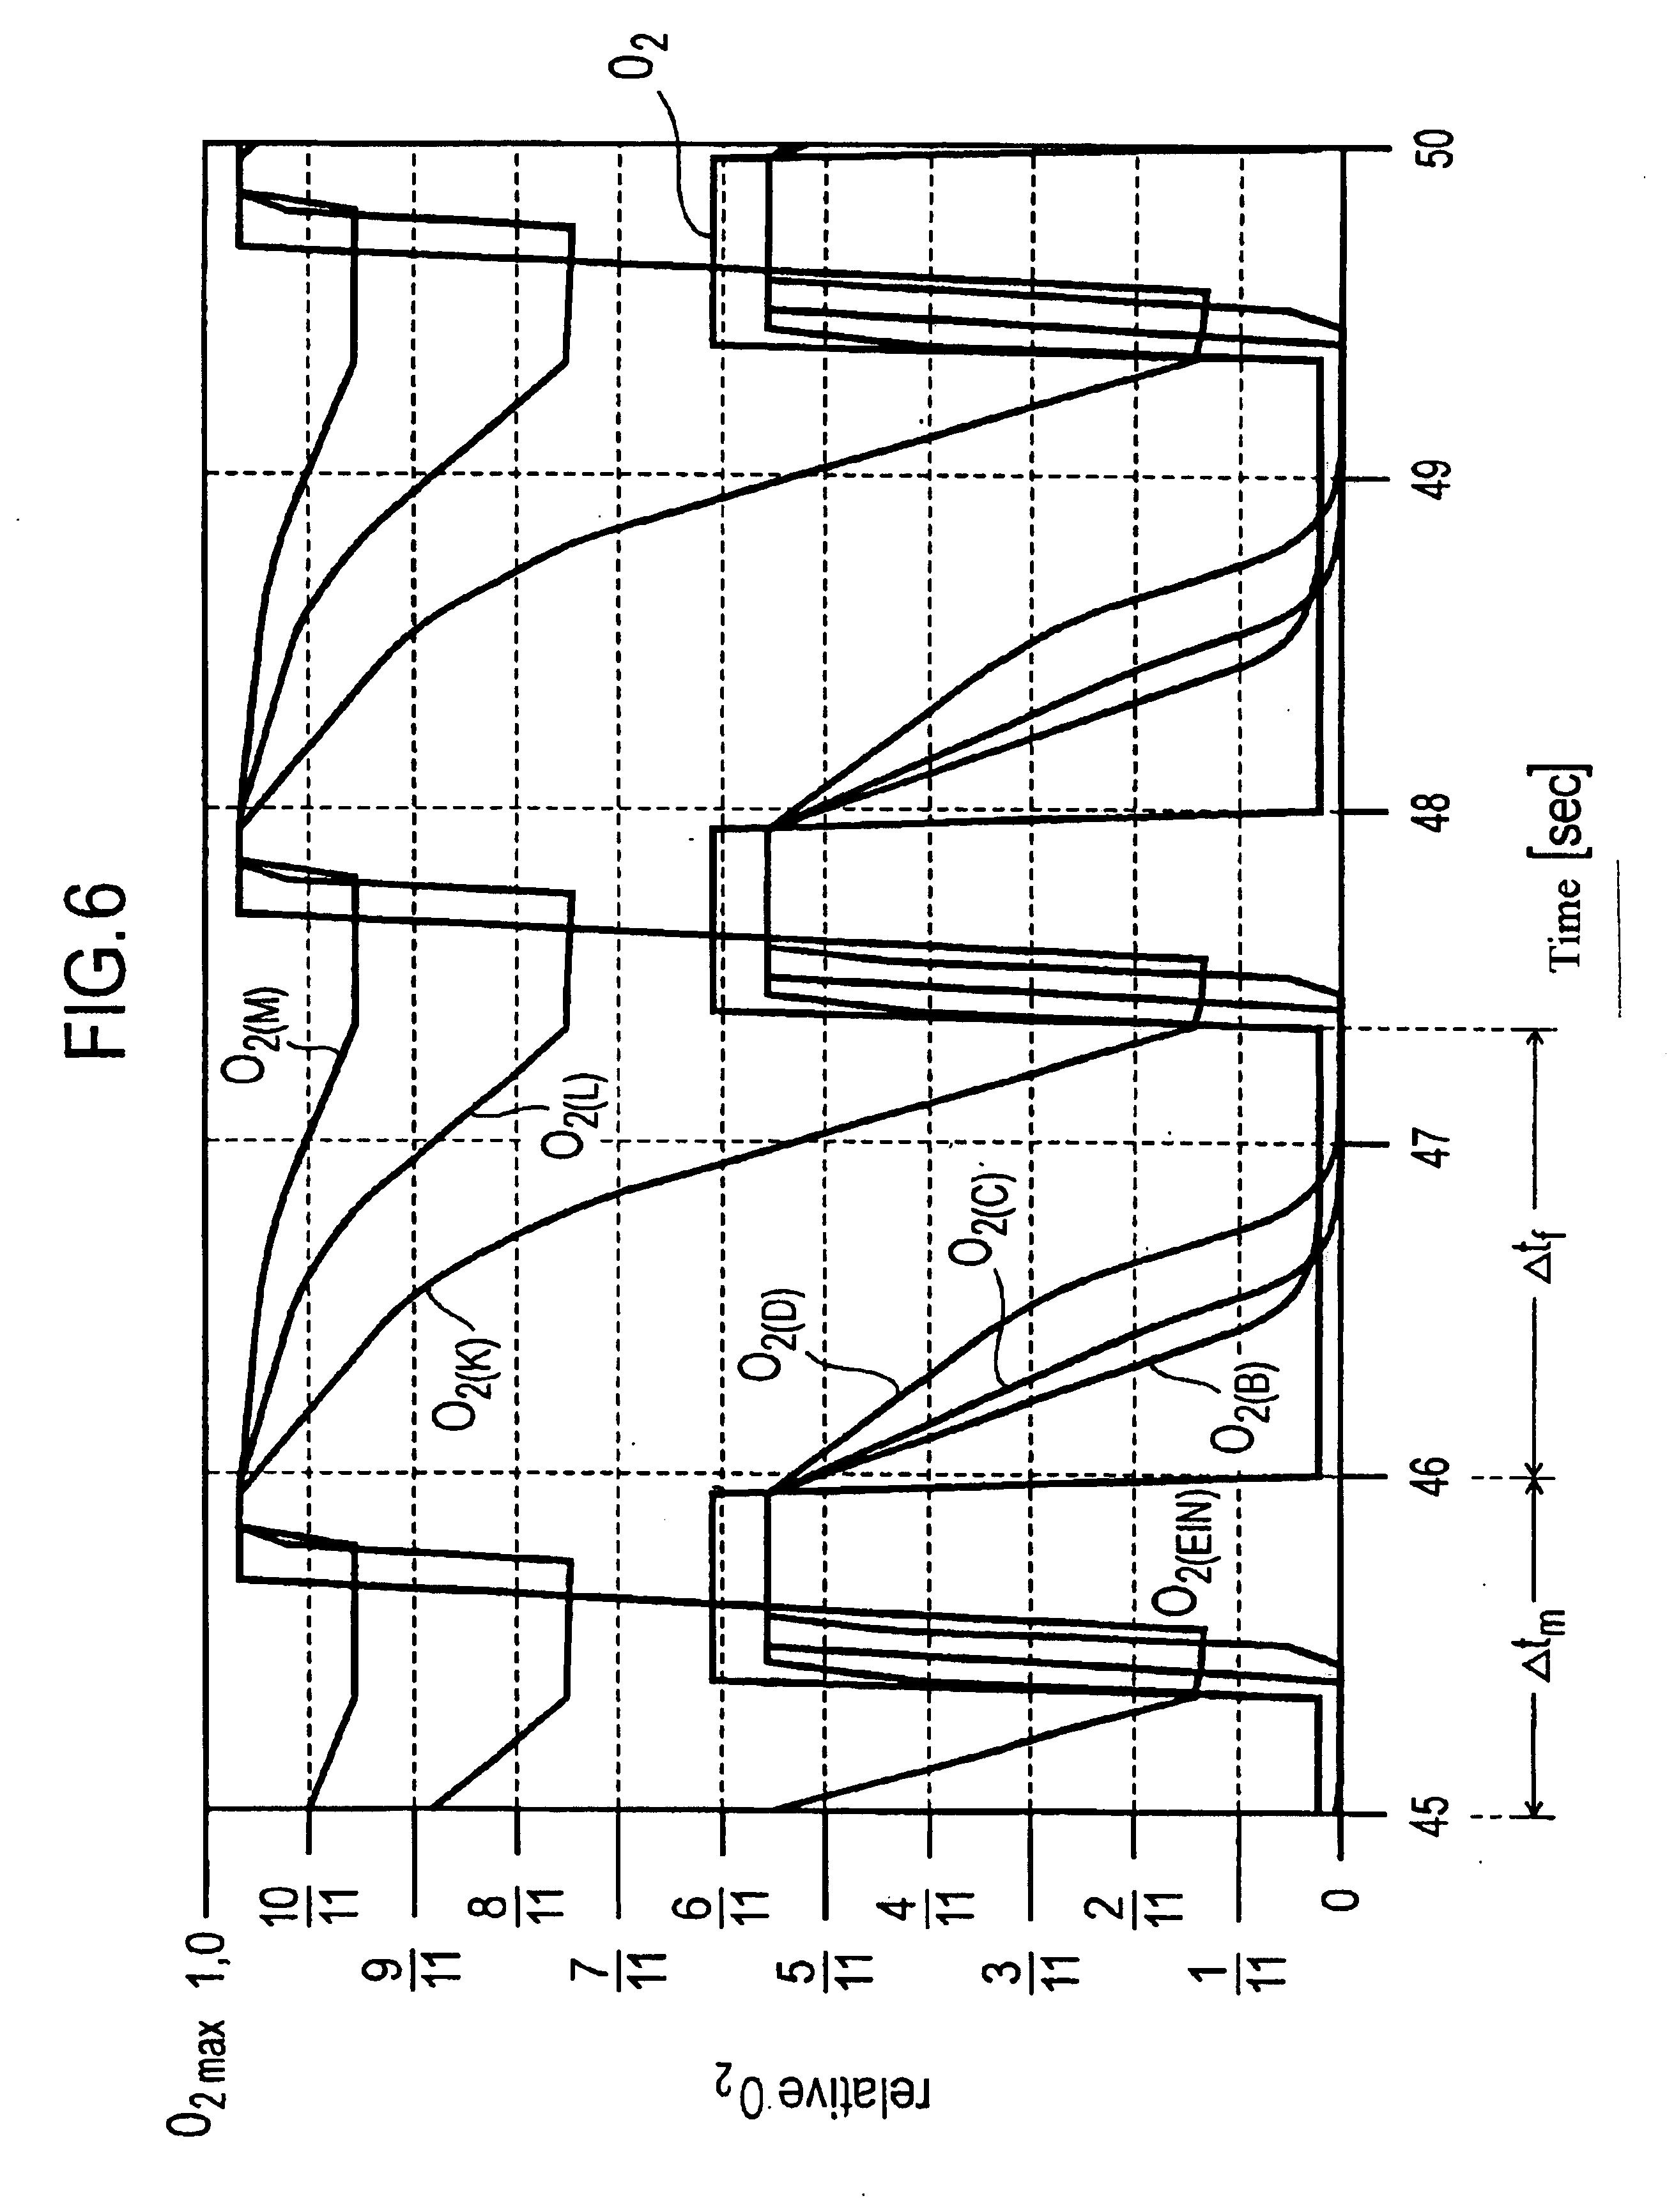 Indicator Two Stroke Engine Diagram Best Secret Wiring 4 Bicycle Imageresizertool Com 2